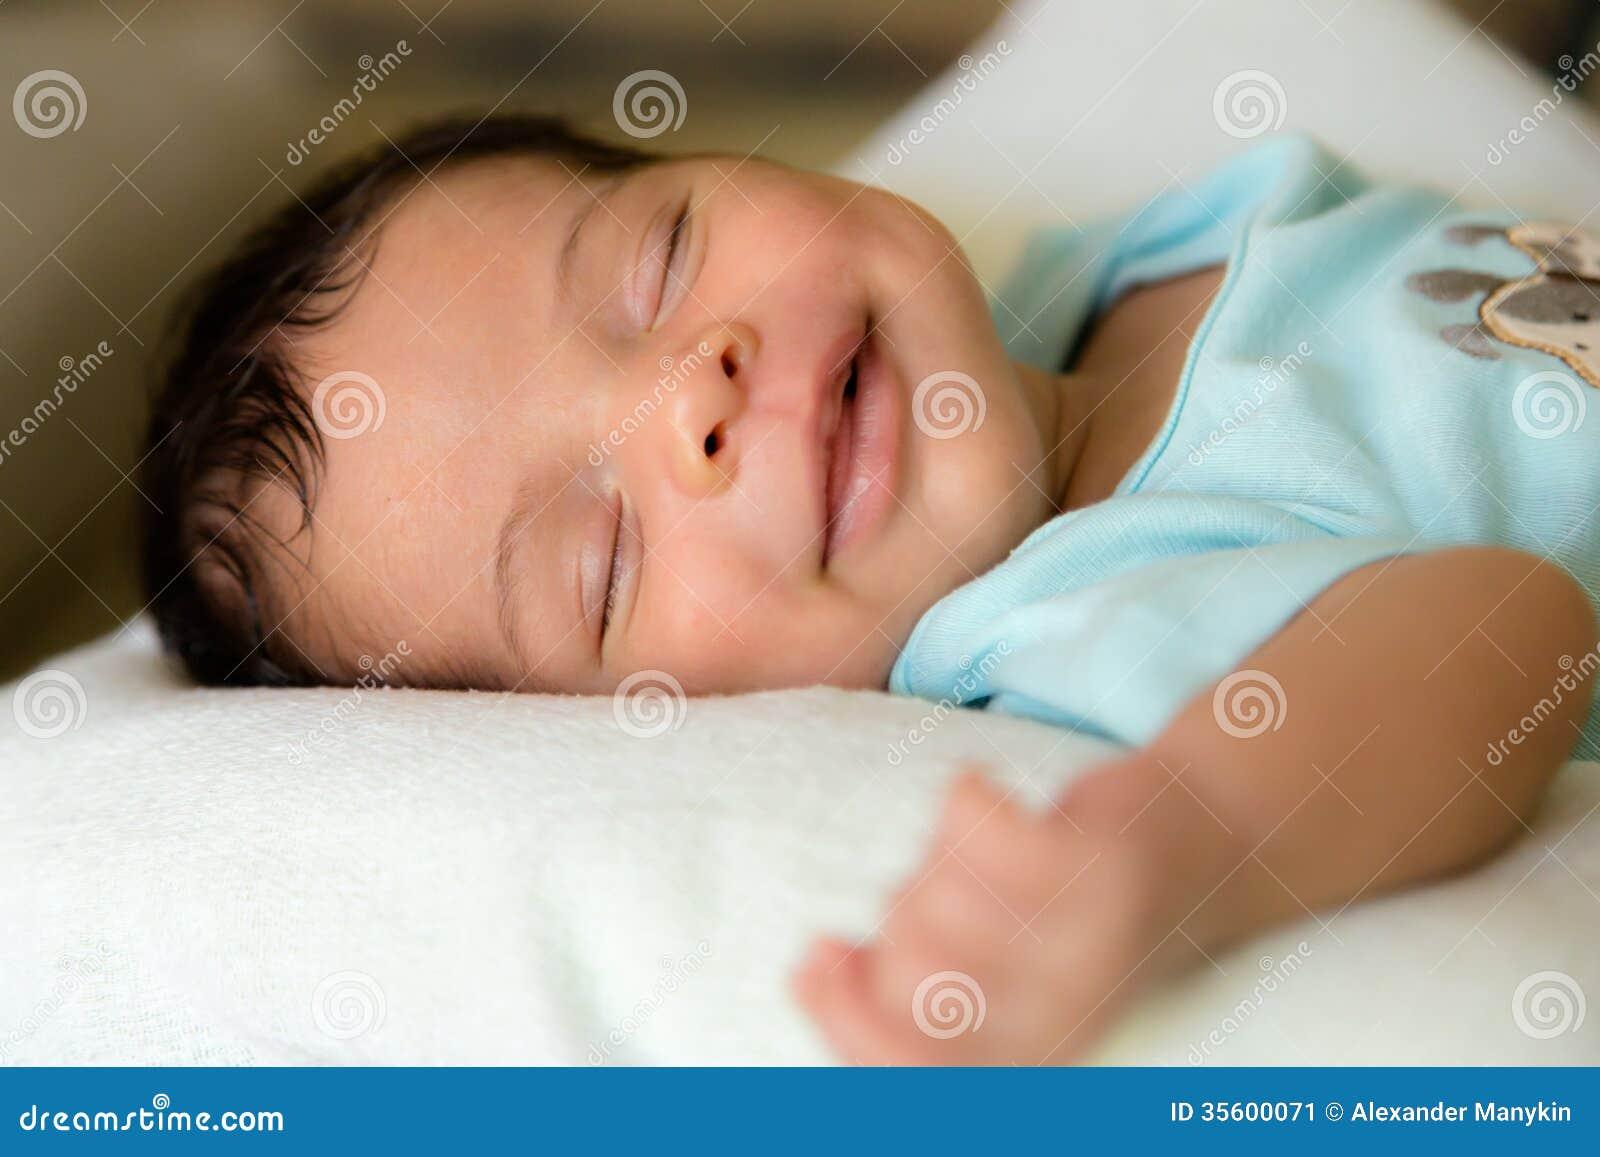 Sleeping smiling babyboy stock image image of hand life for Sleeping bed